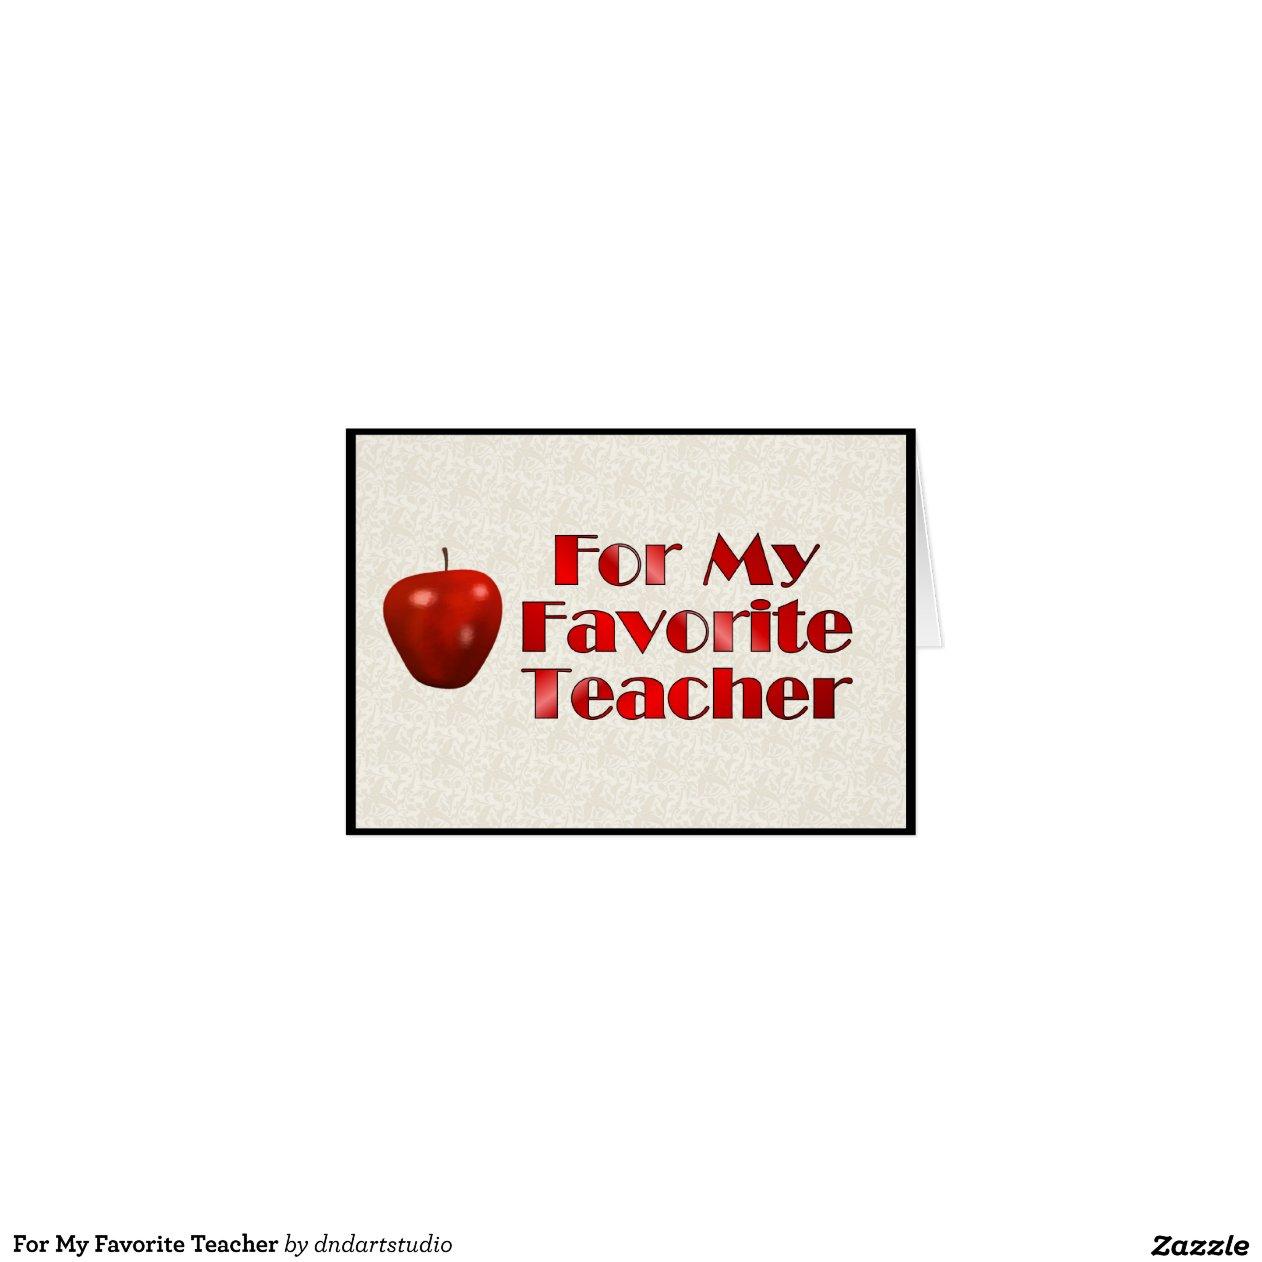 Sorry, my favourite teacher